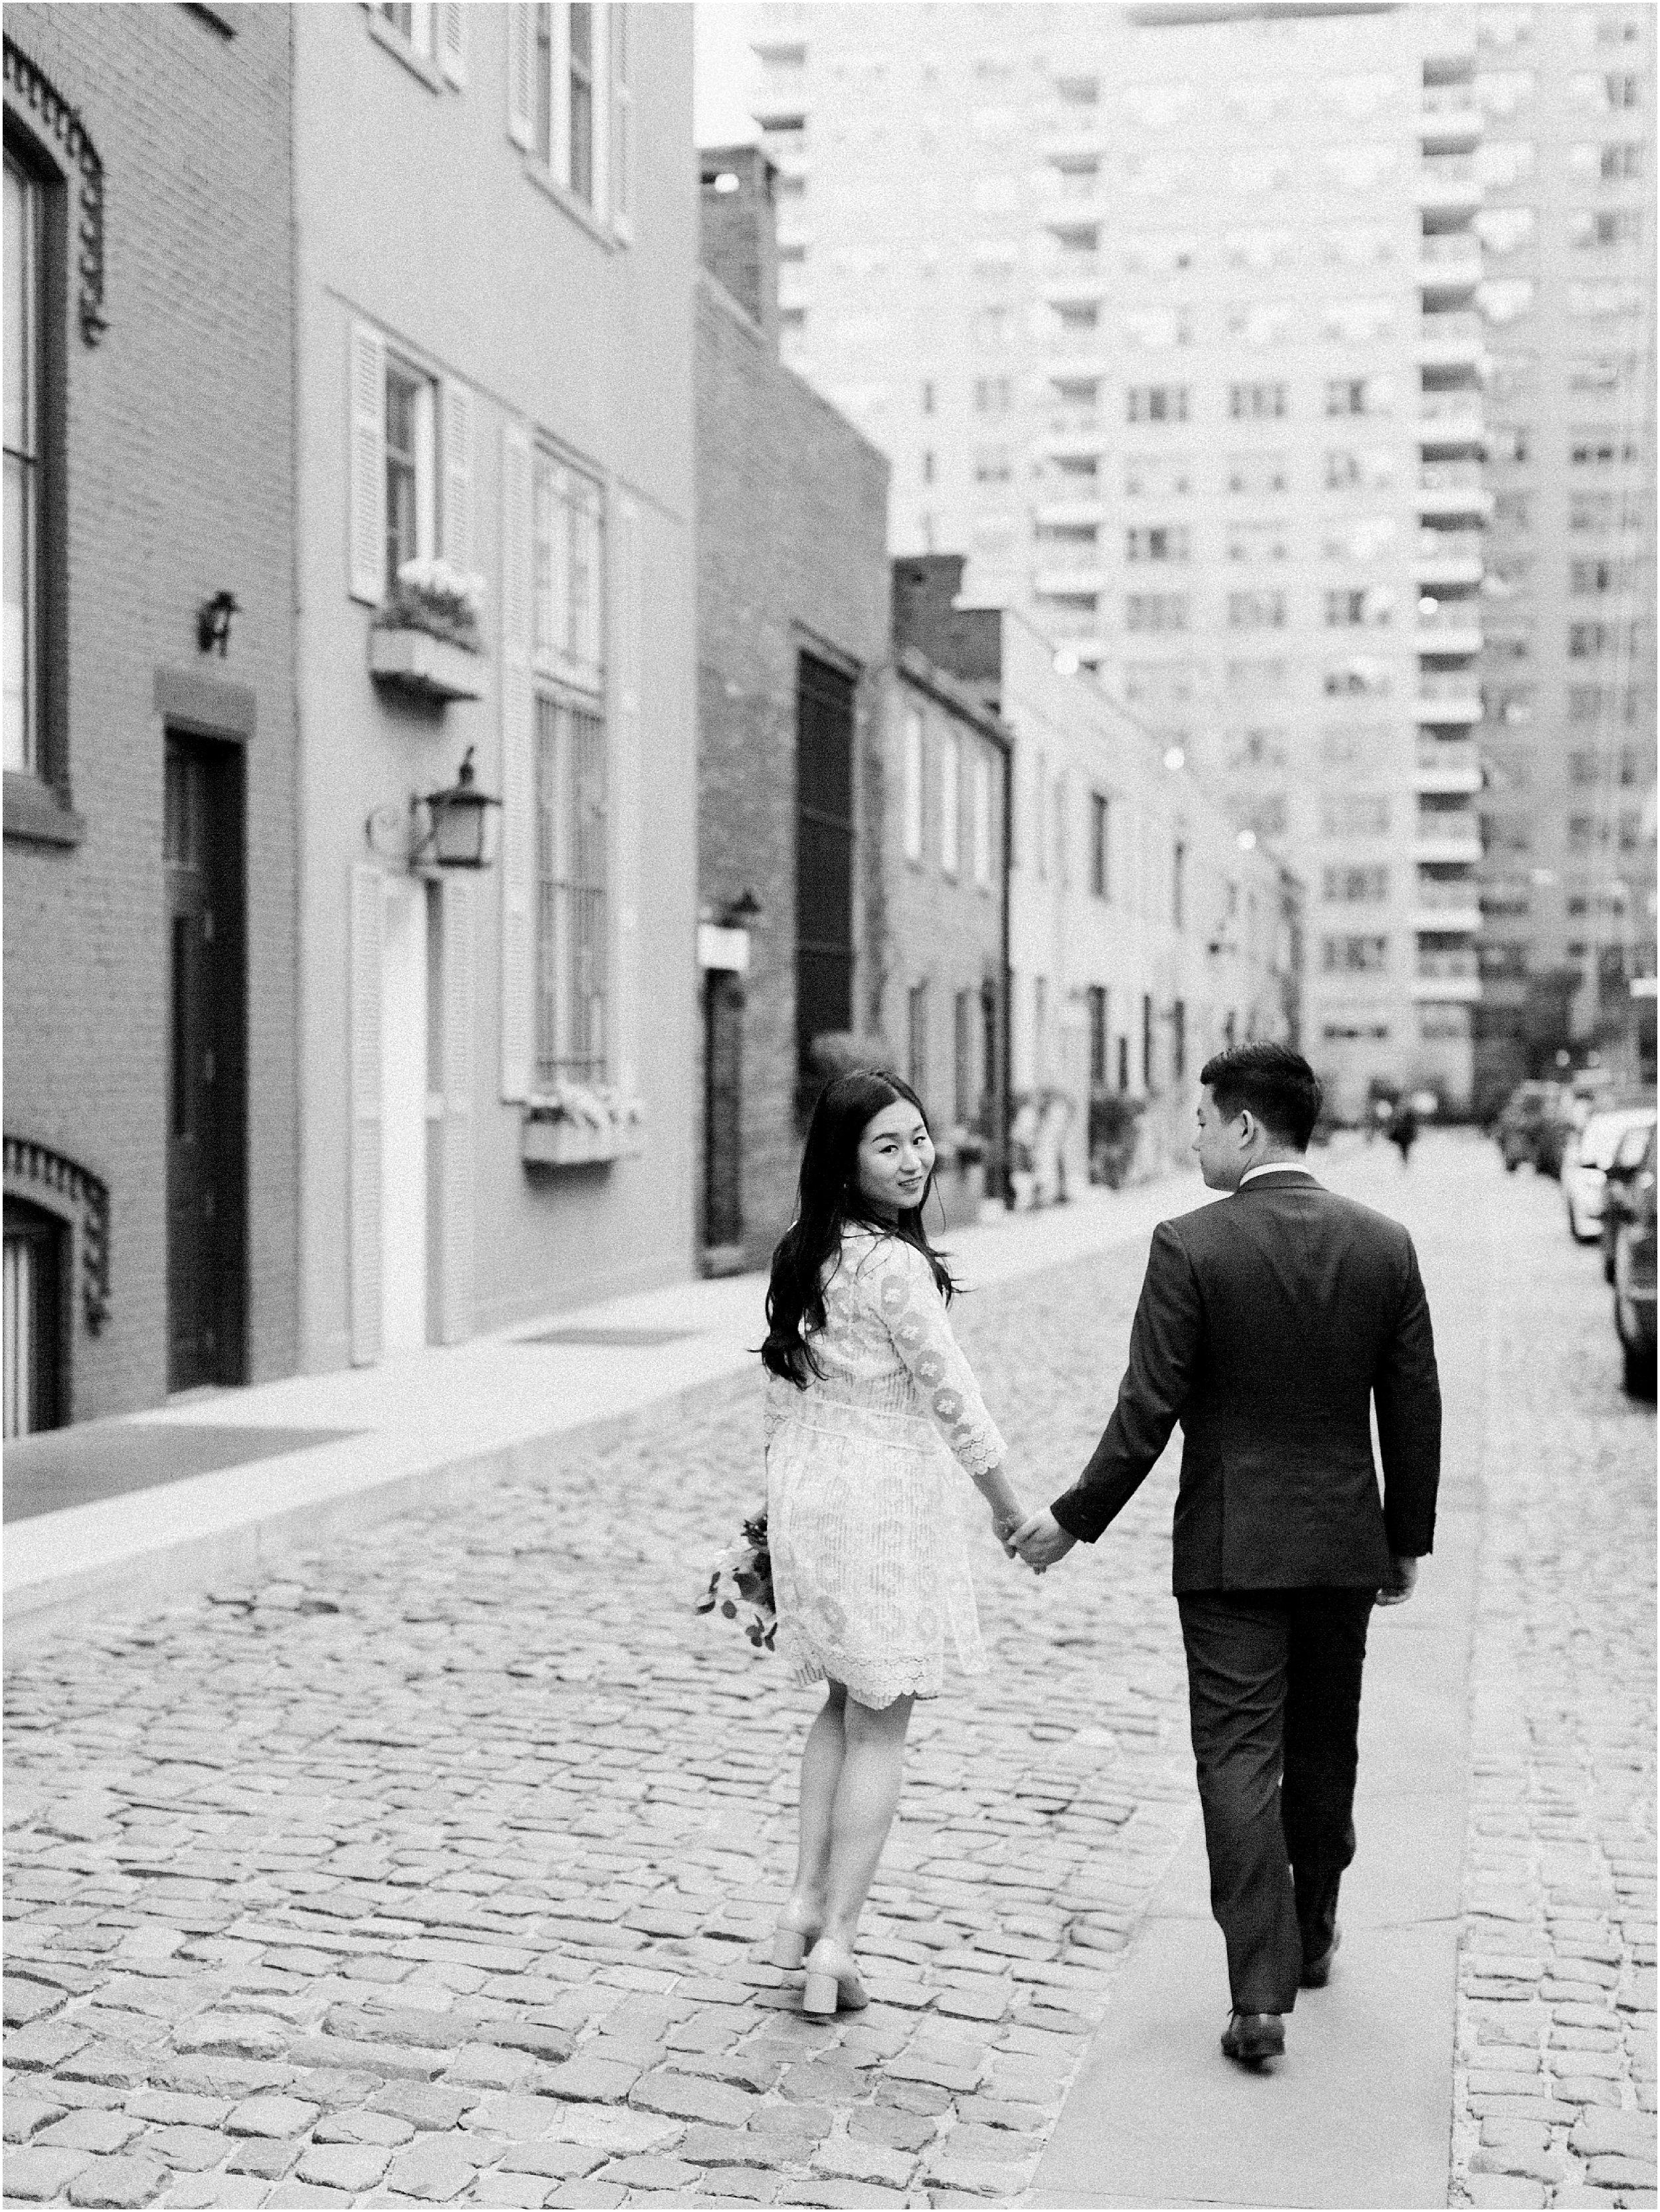 JeremiahRachelPhotography_CentralPark_NYC_SpringtimeBloom_EngagementSession0034.JPG